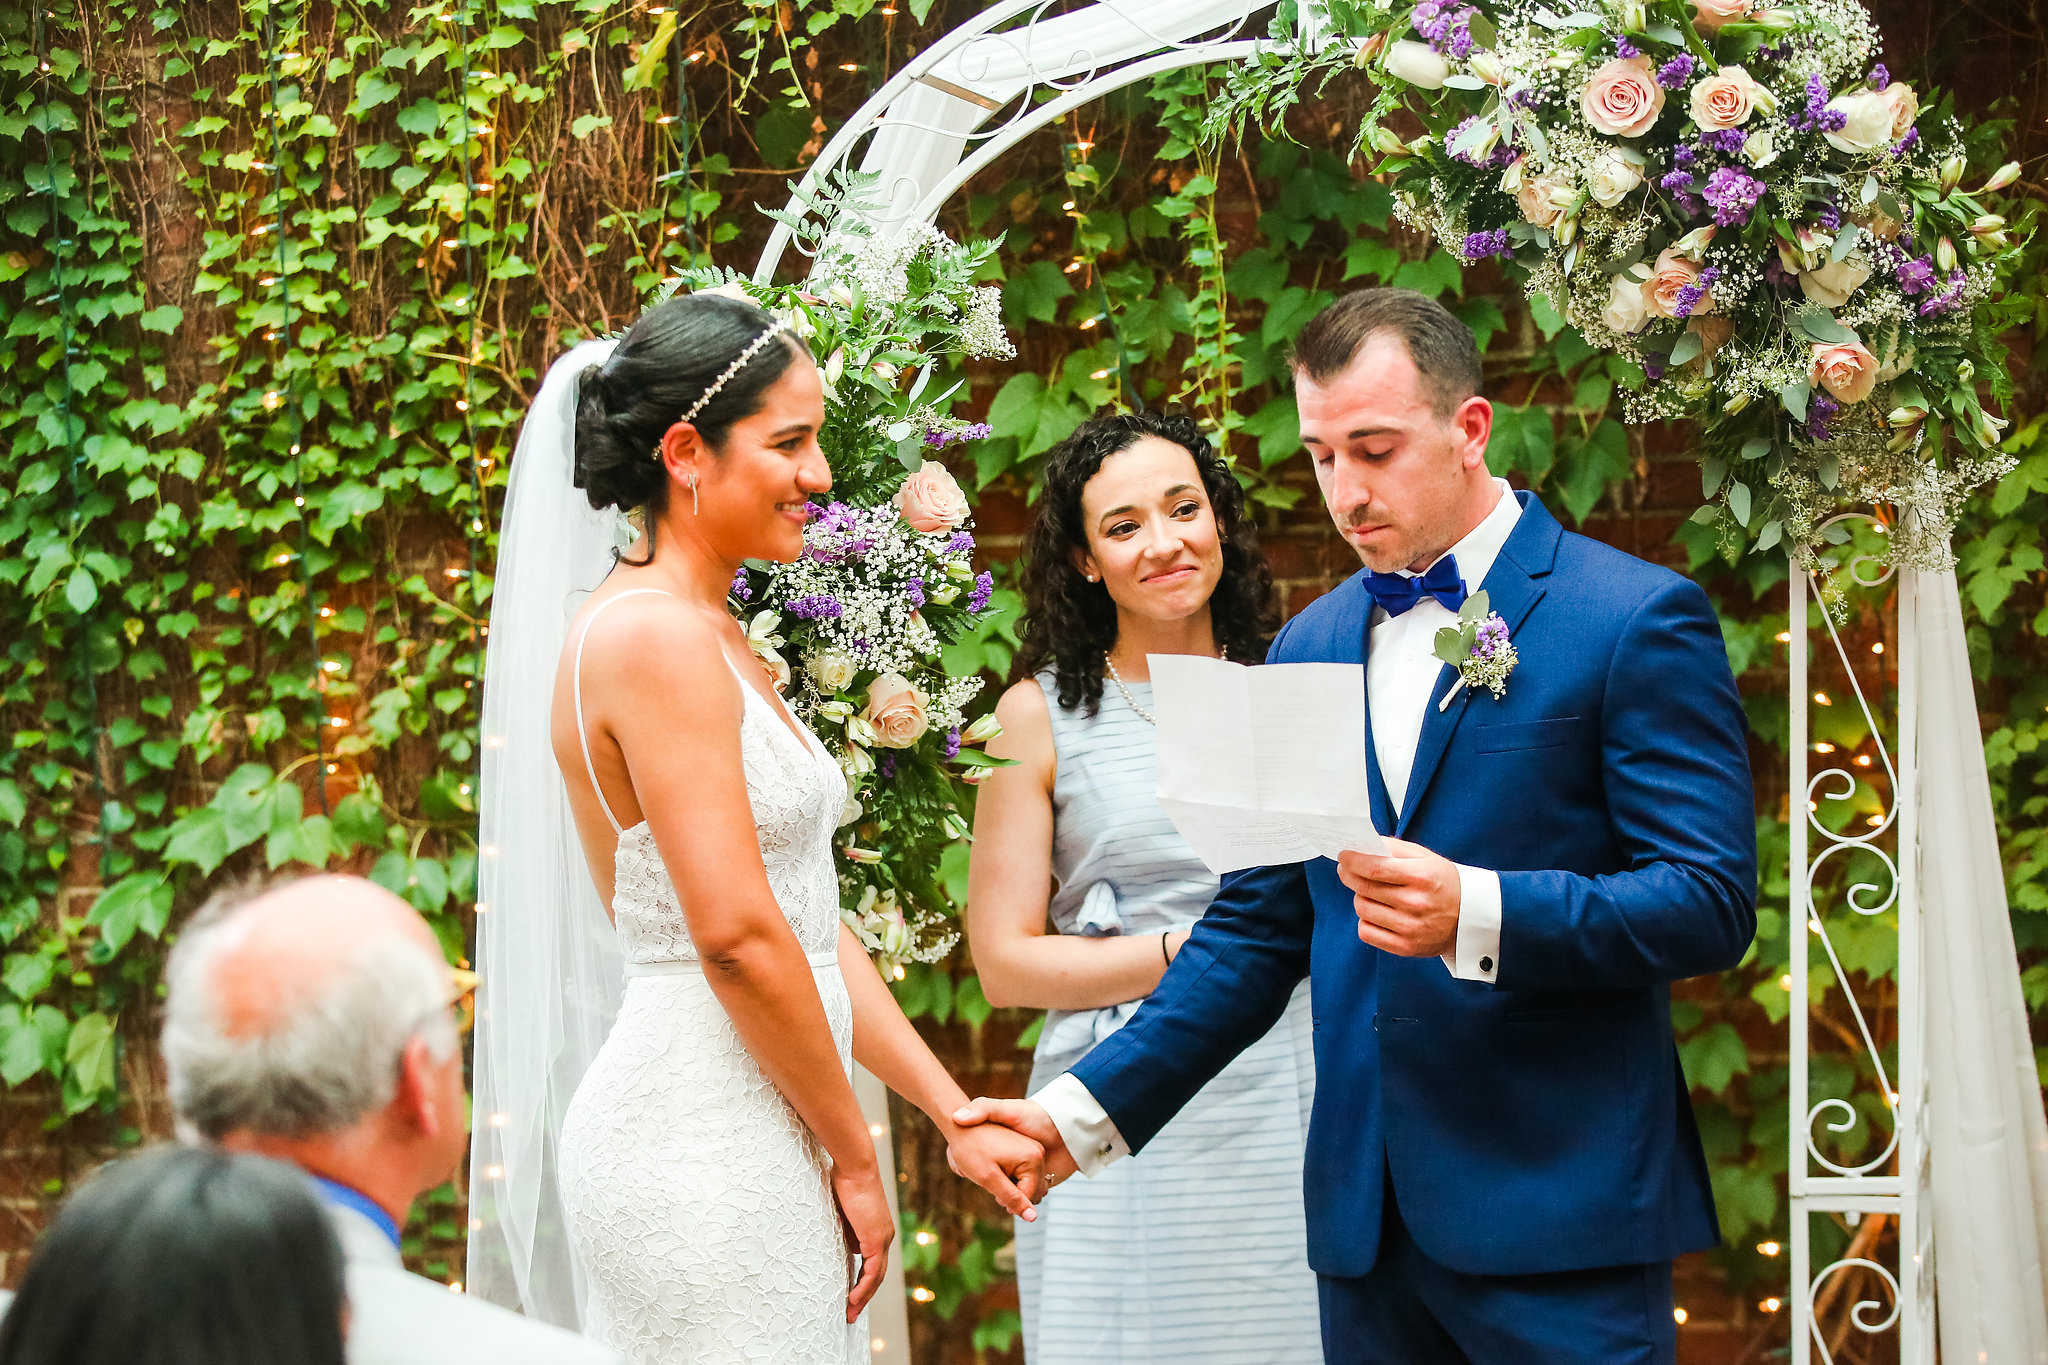 Korey-&-Anouk-Wedding-at-The-Tabard-Inn-www.jonflemingphotography.com(144of392).jpg